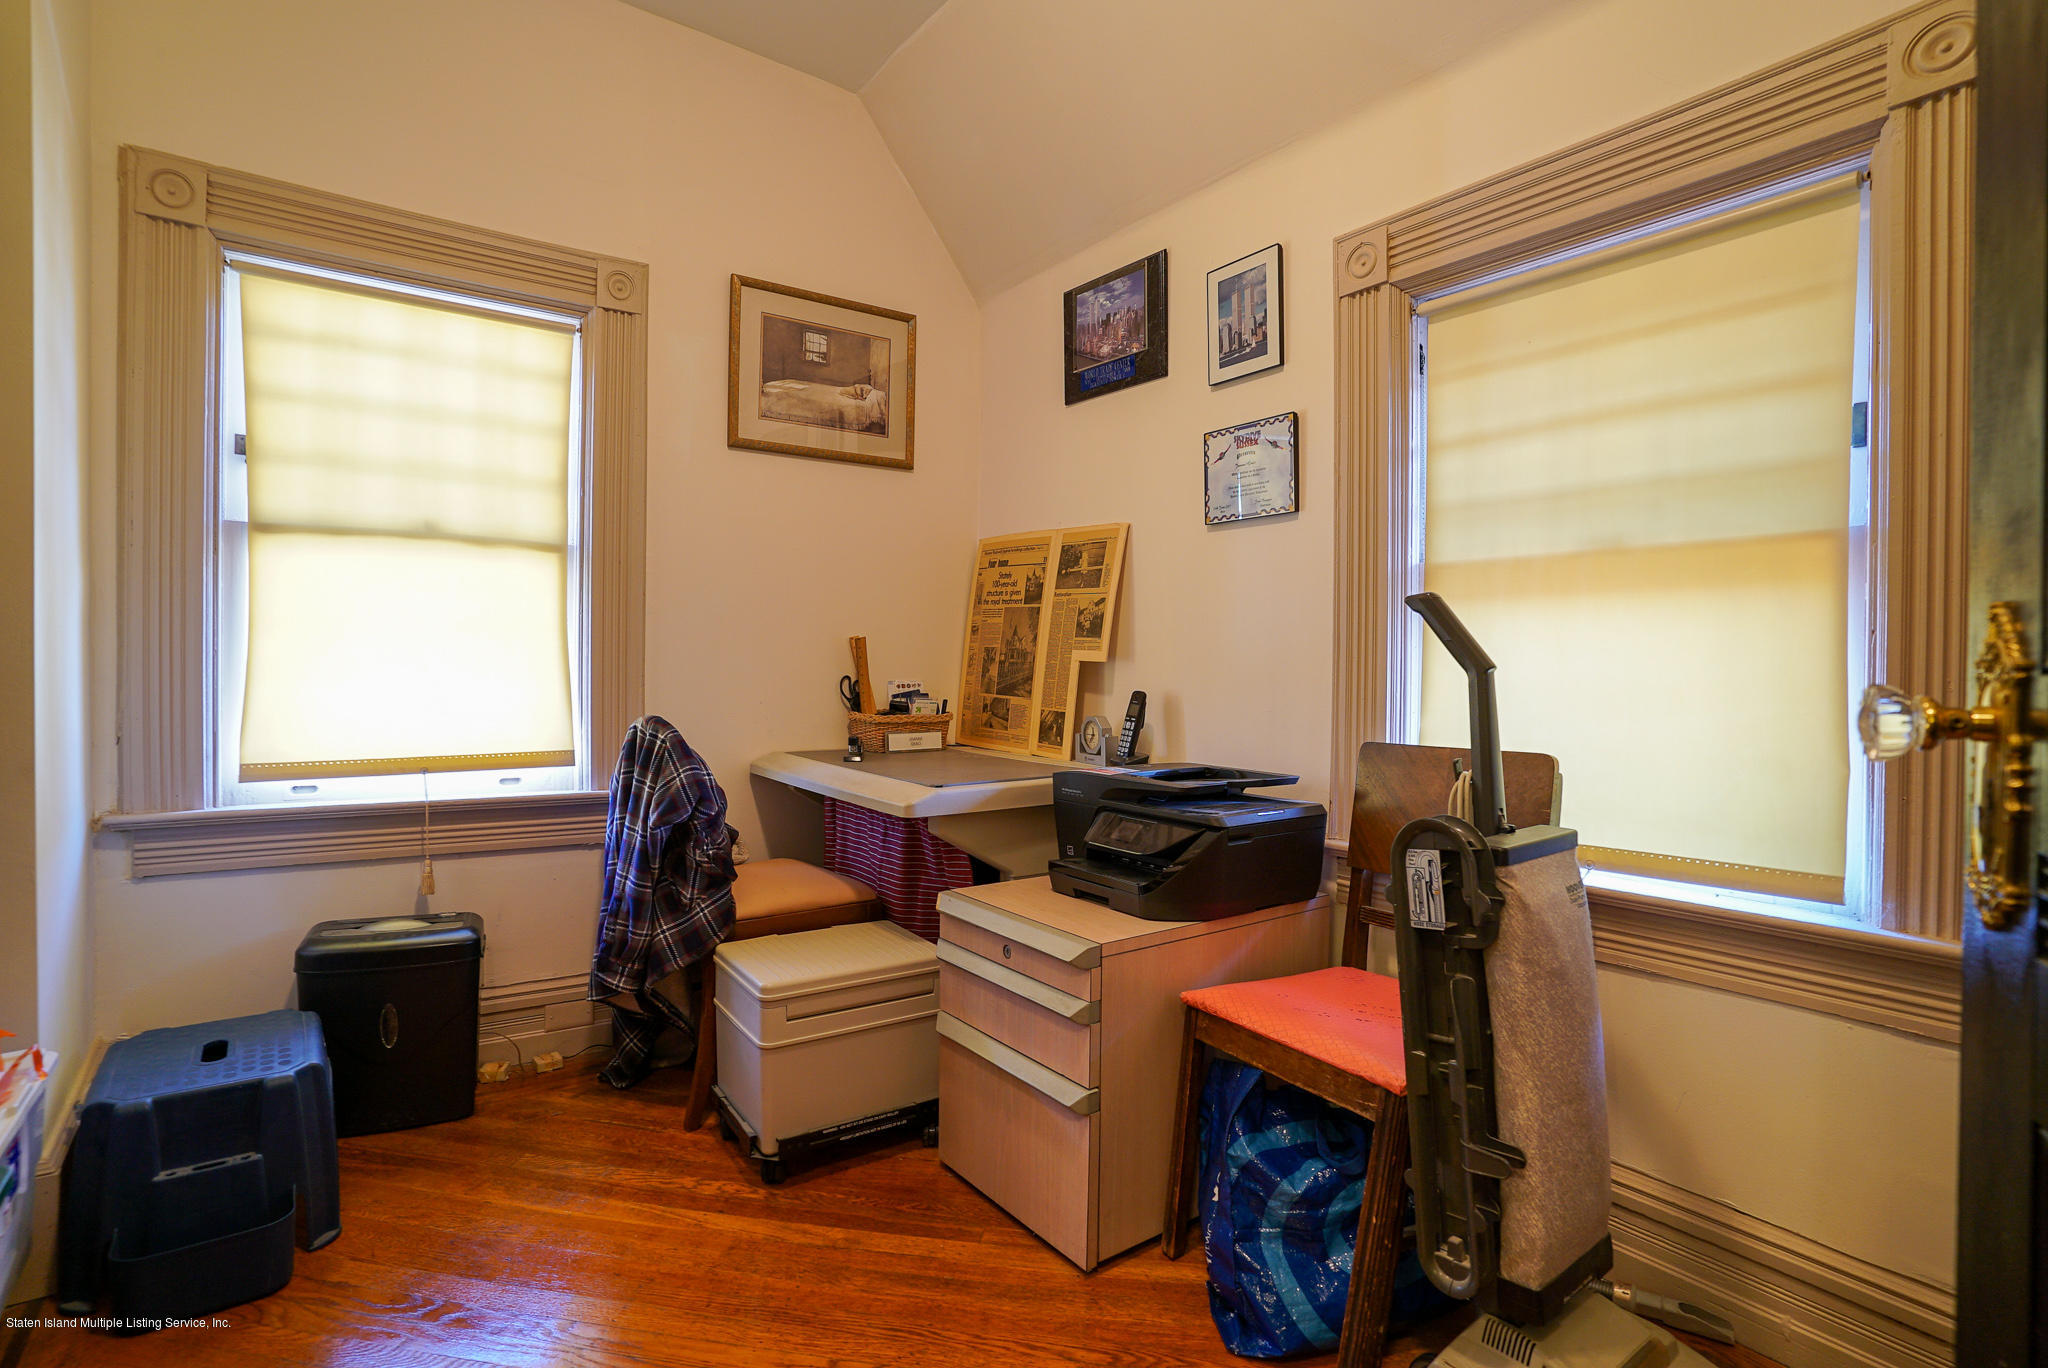 Single Family - Detached 309 Guyon Avenue  Staten Island, NY 10306, MLS-1142302-34